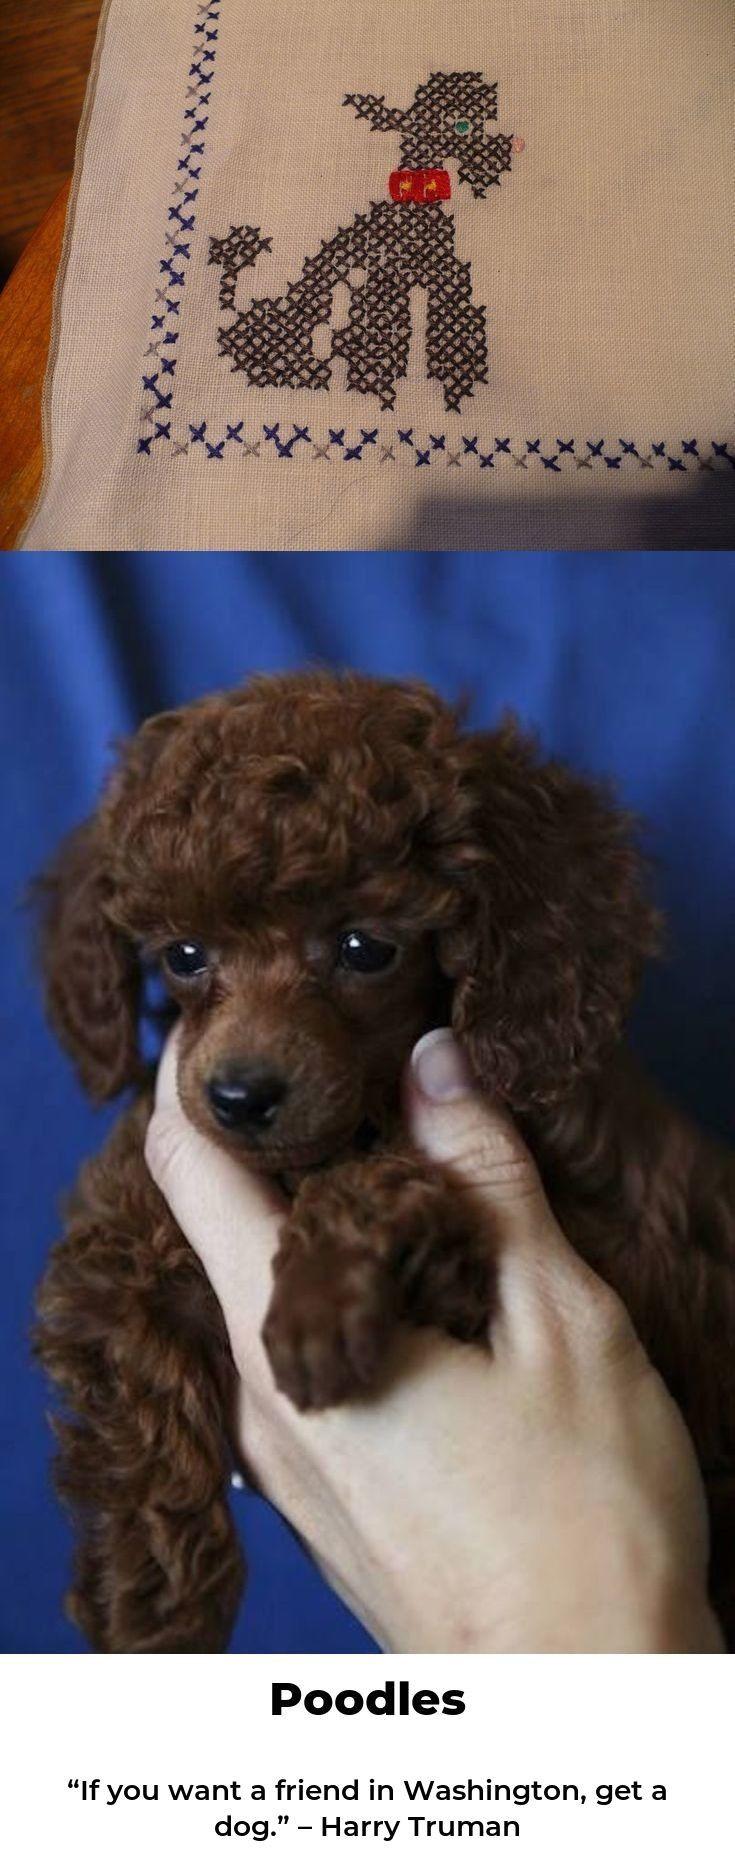 Poodle Love Poodlecross Poodle Tiny Toy Poodle Poodle Dogs